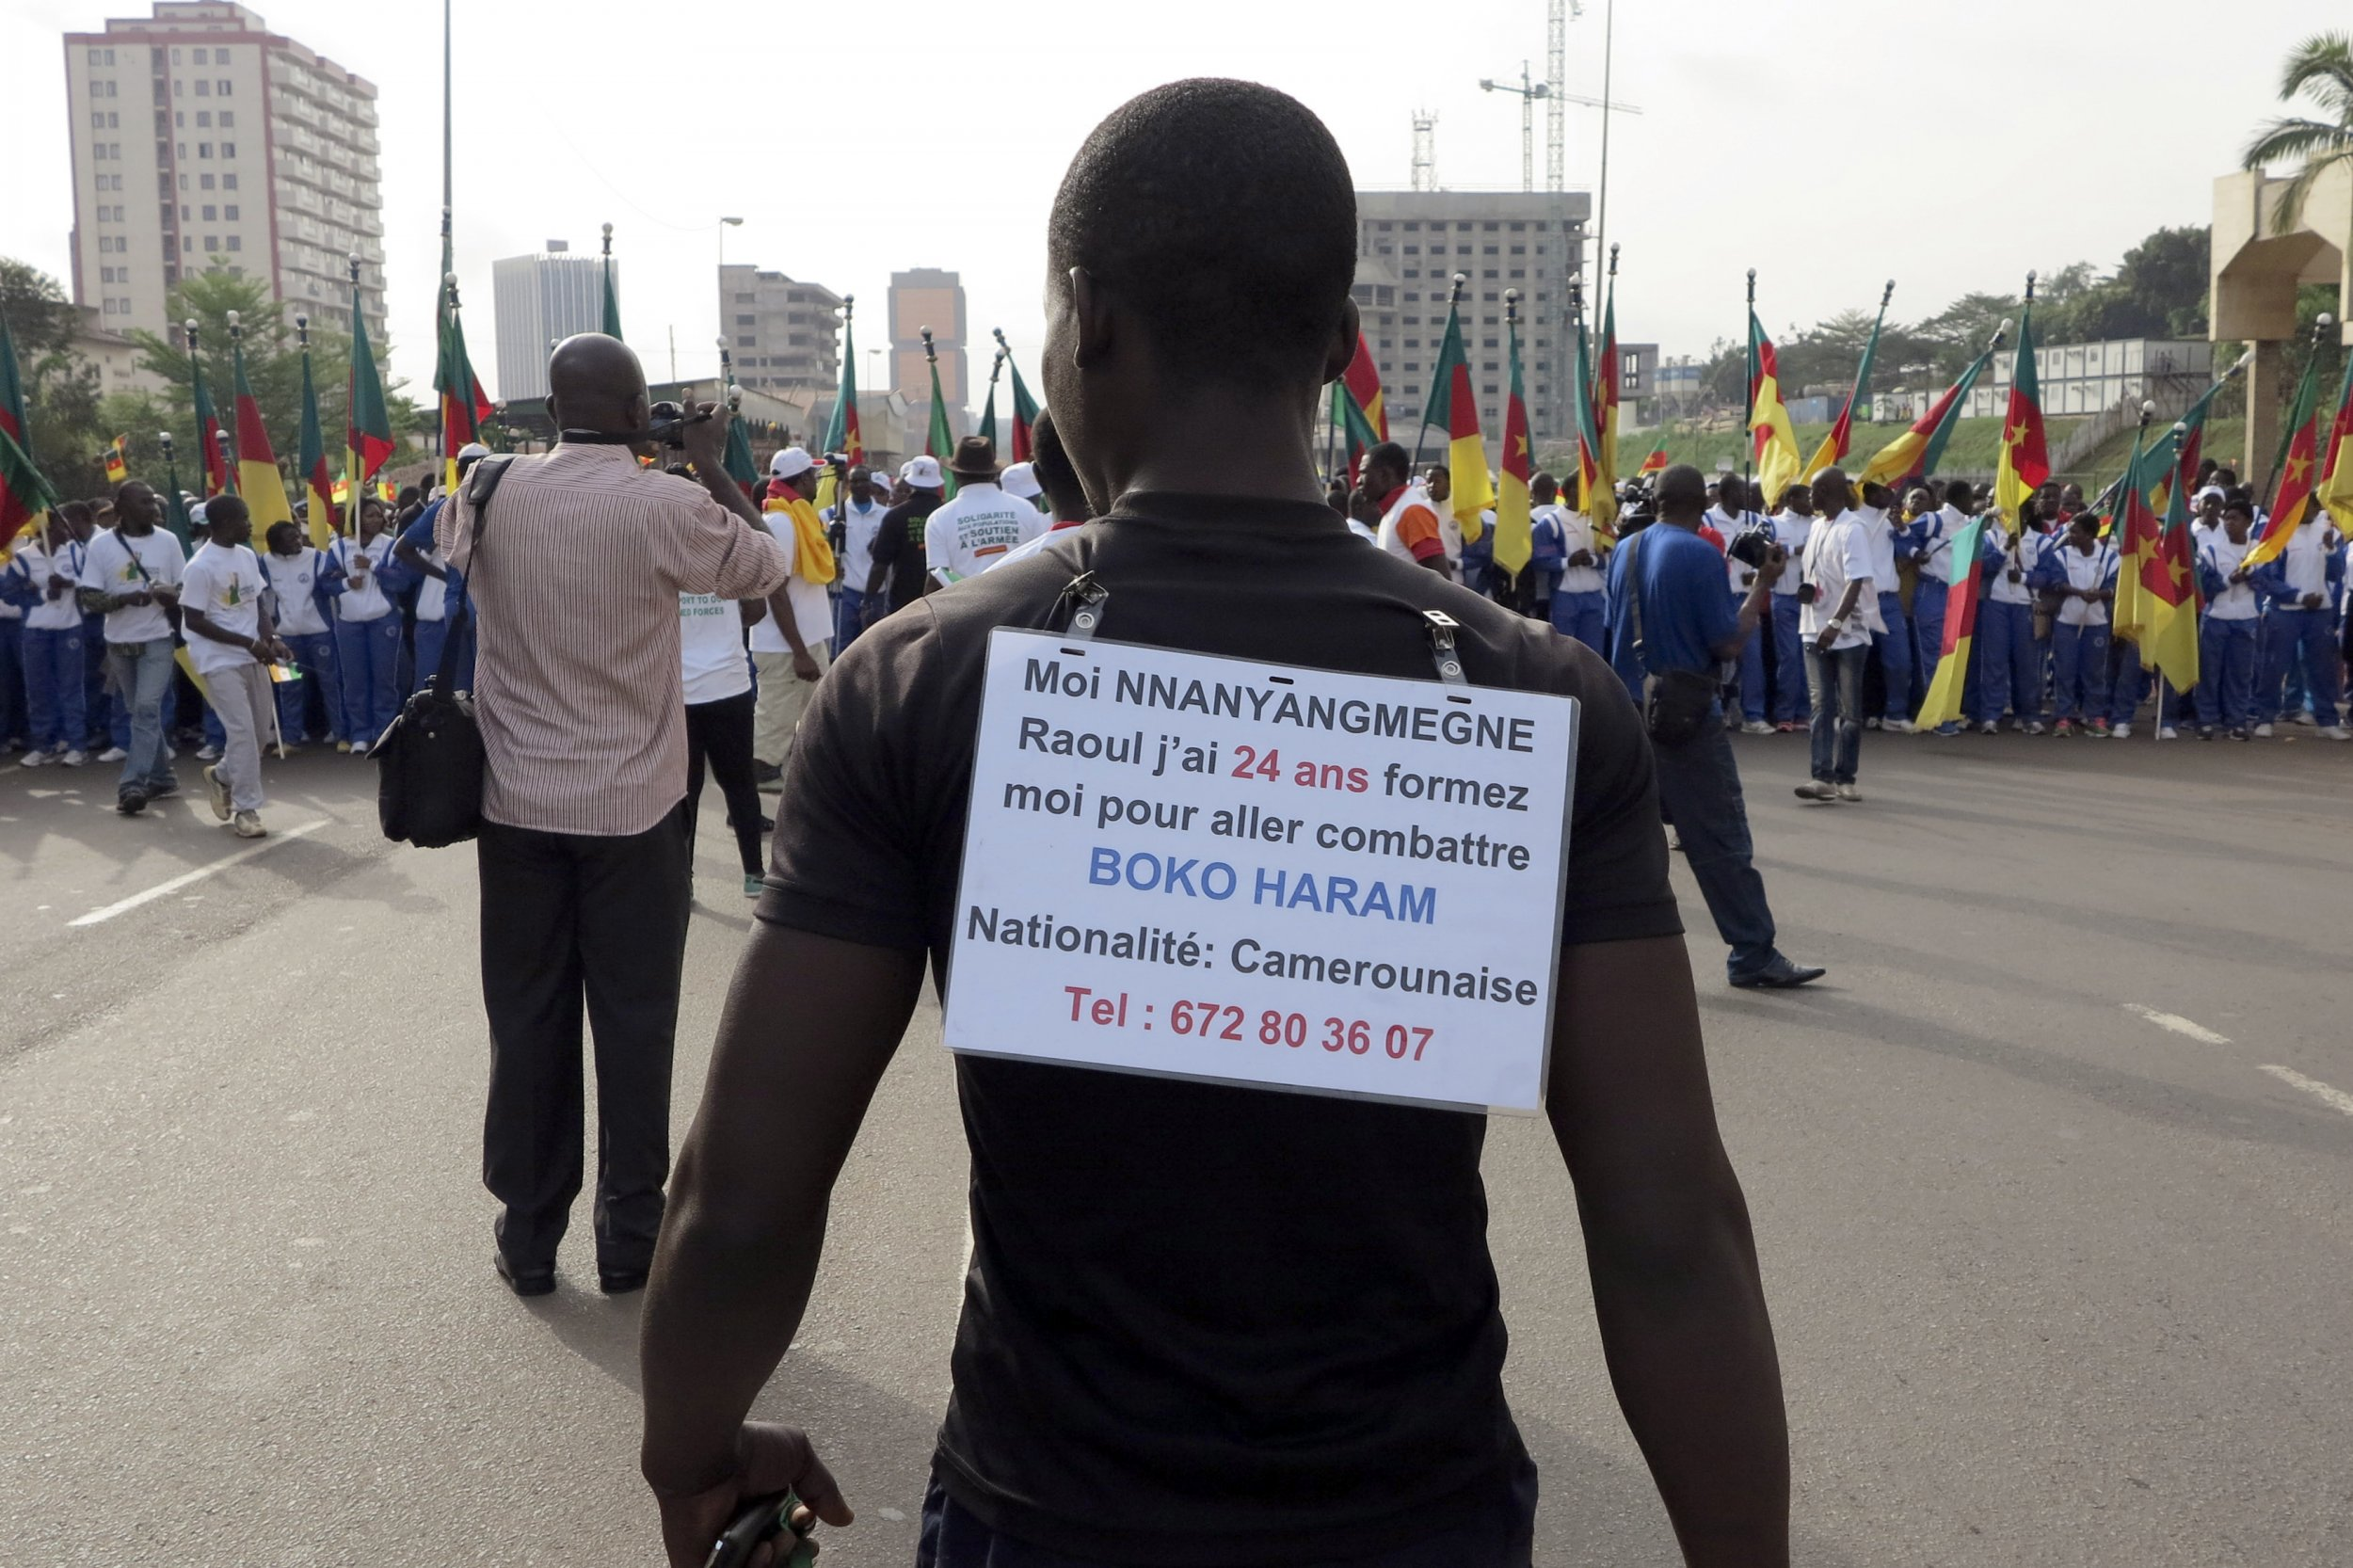 1202 Boko Haram protest Cameroon